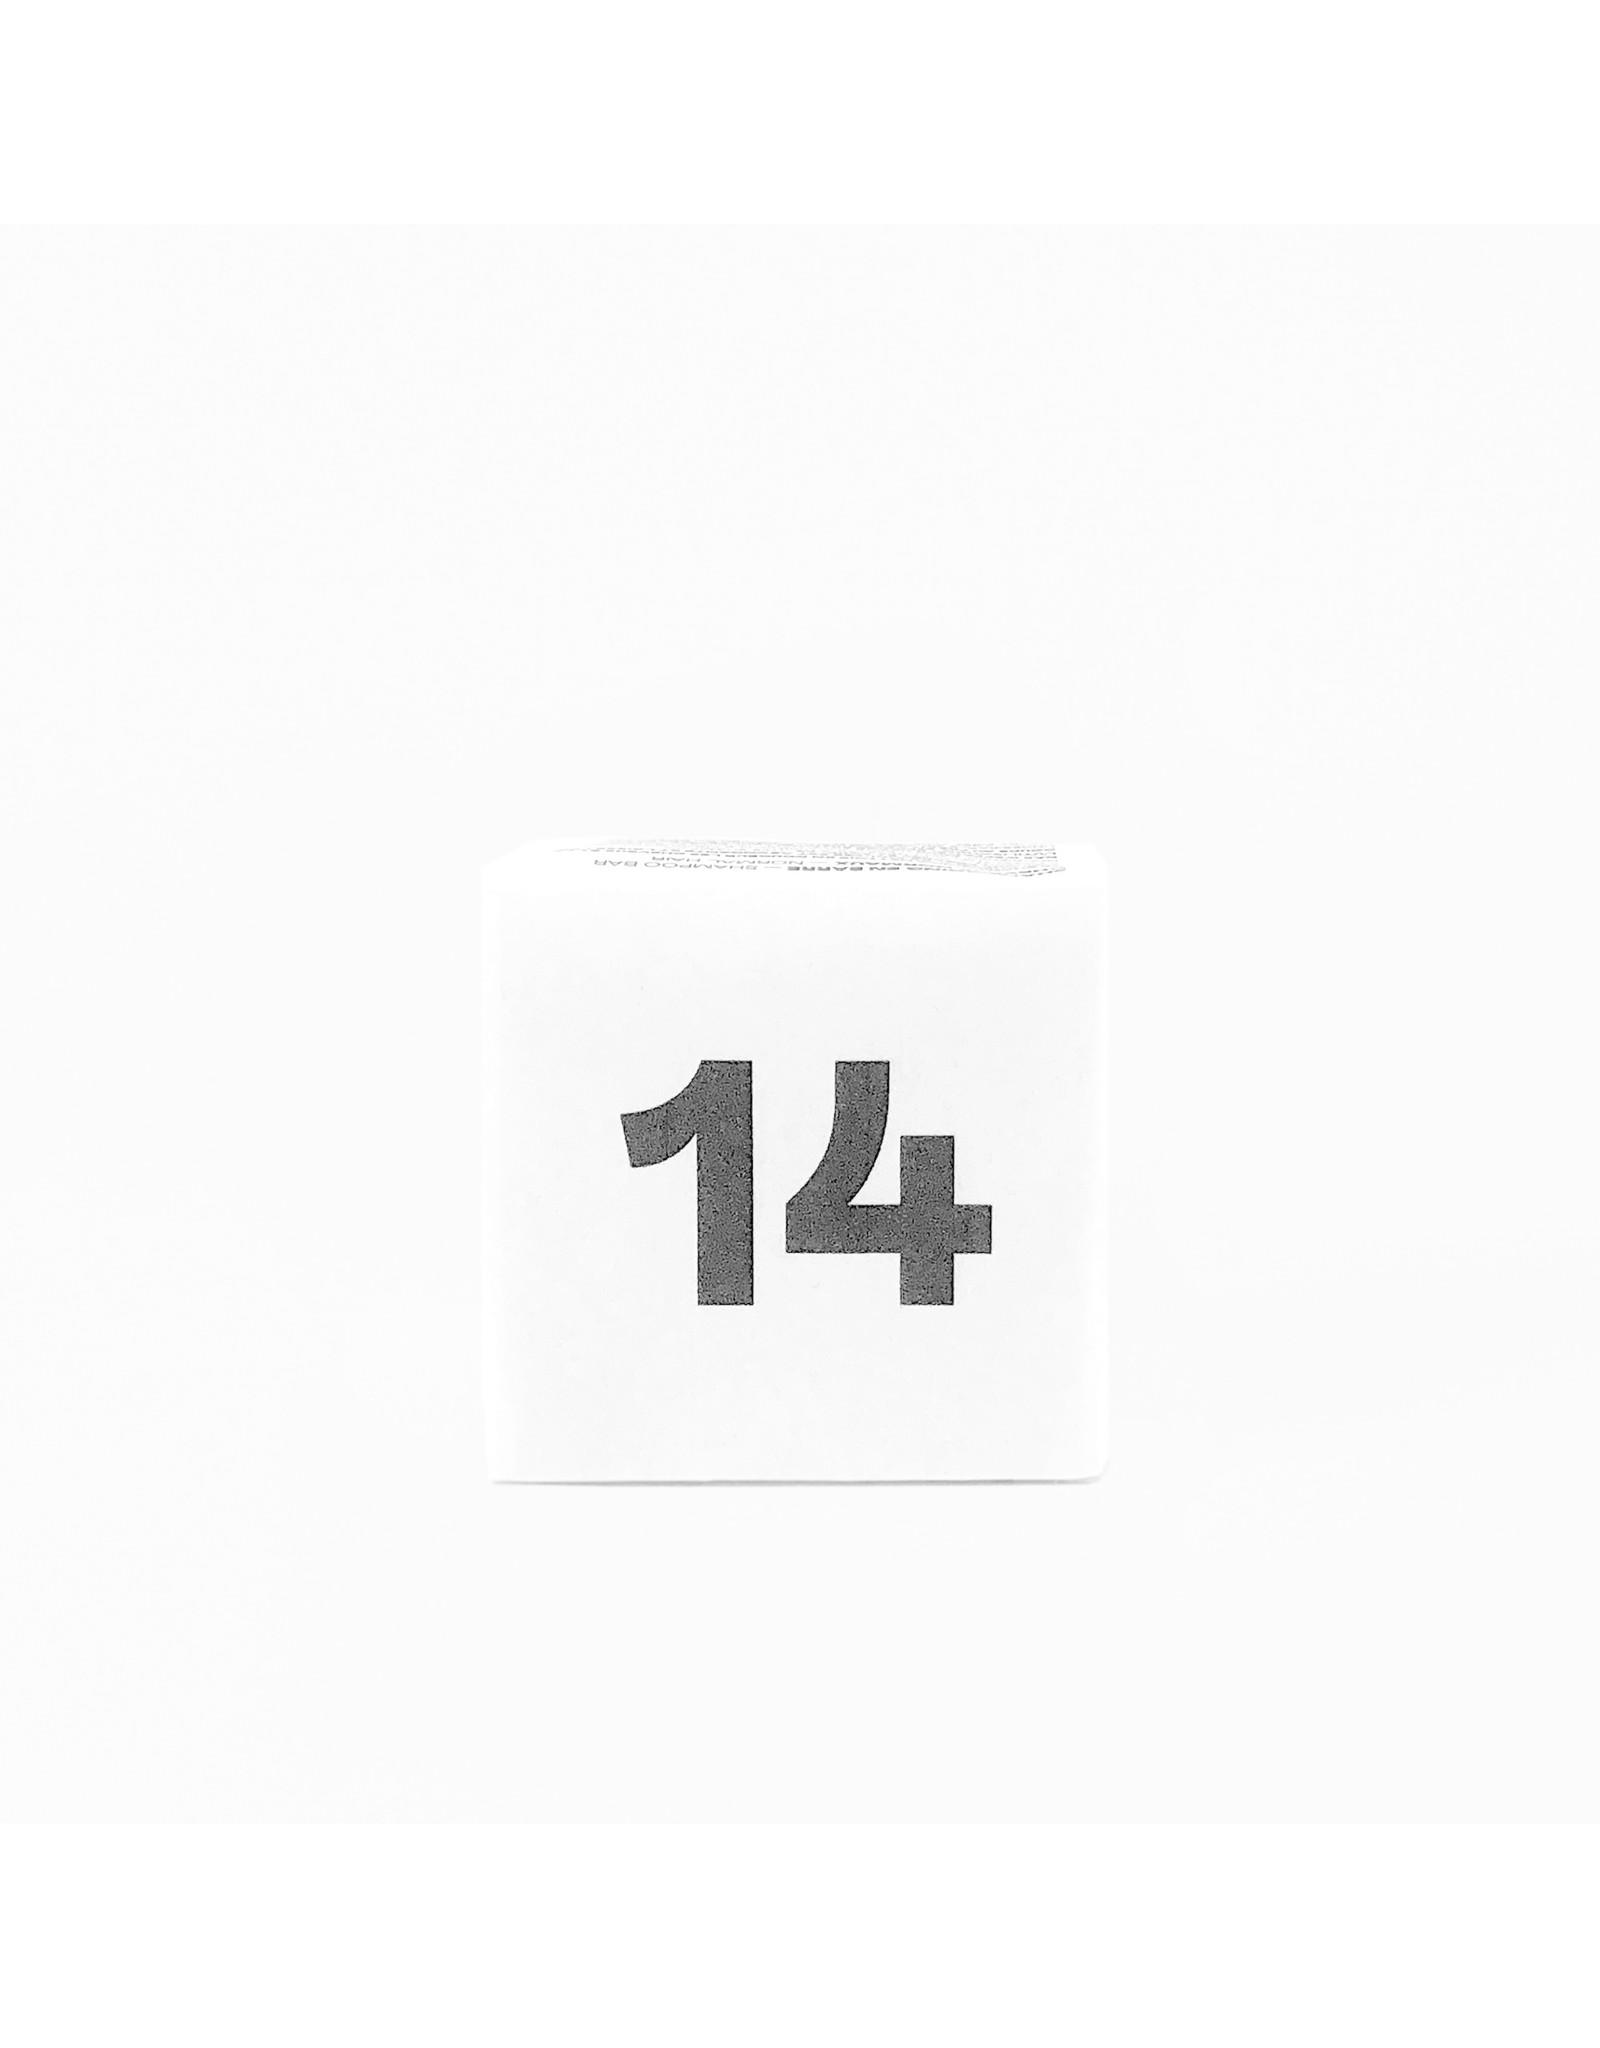 Suum Shampooing en barre #14 sans odeur